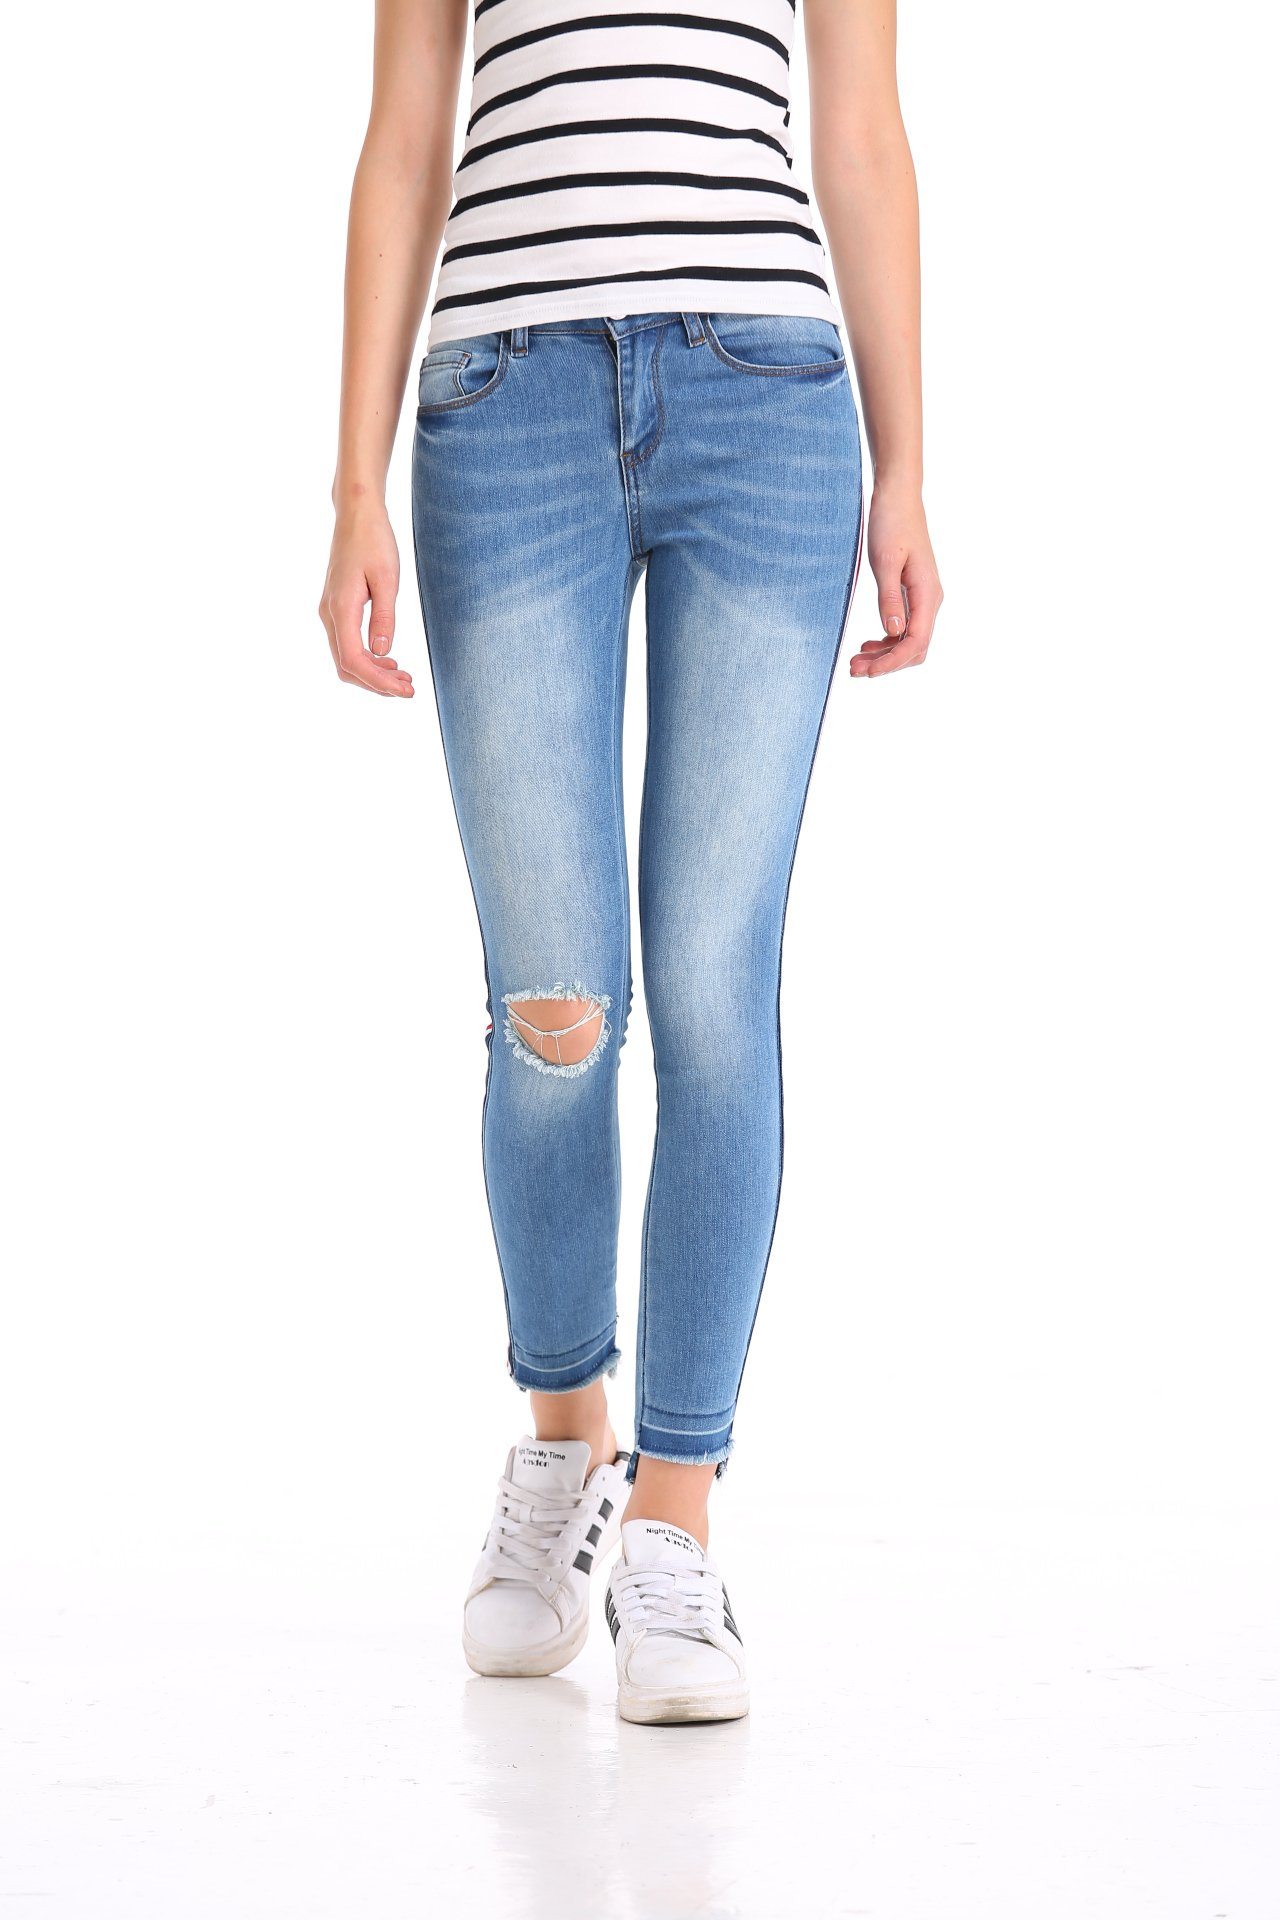 Pohiya Color Stripe Jeans (13)